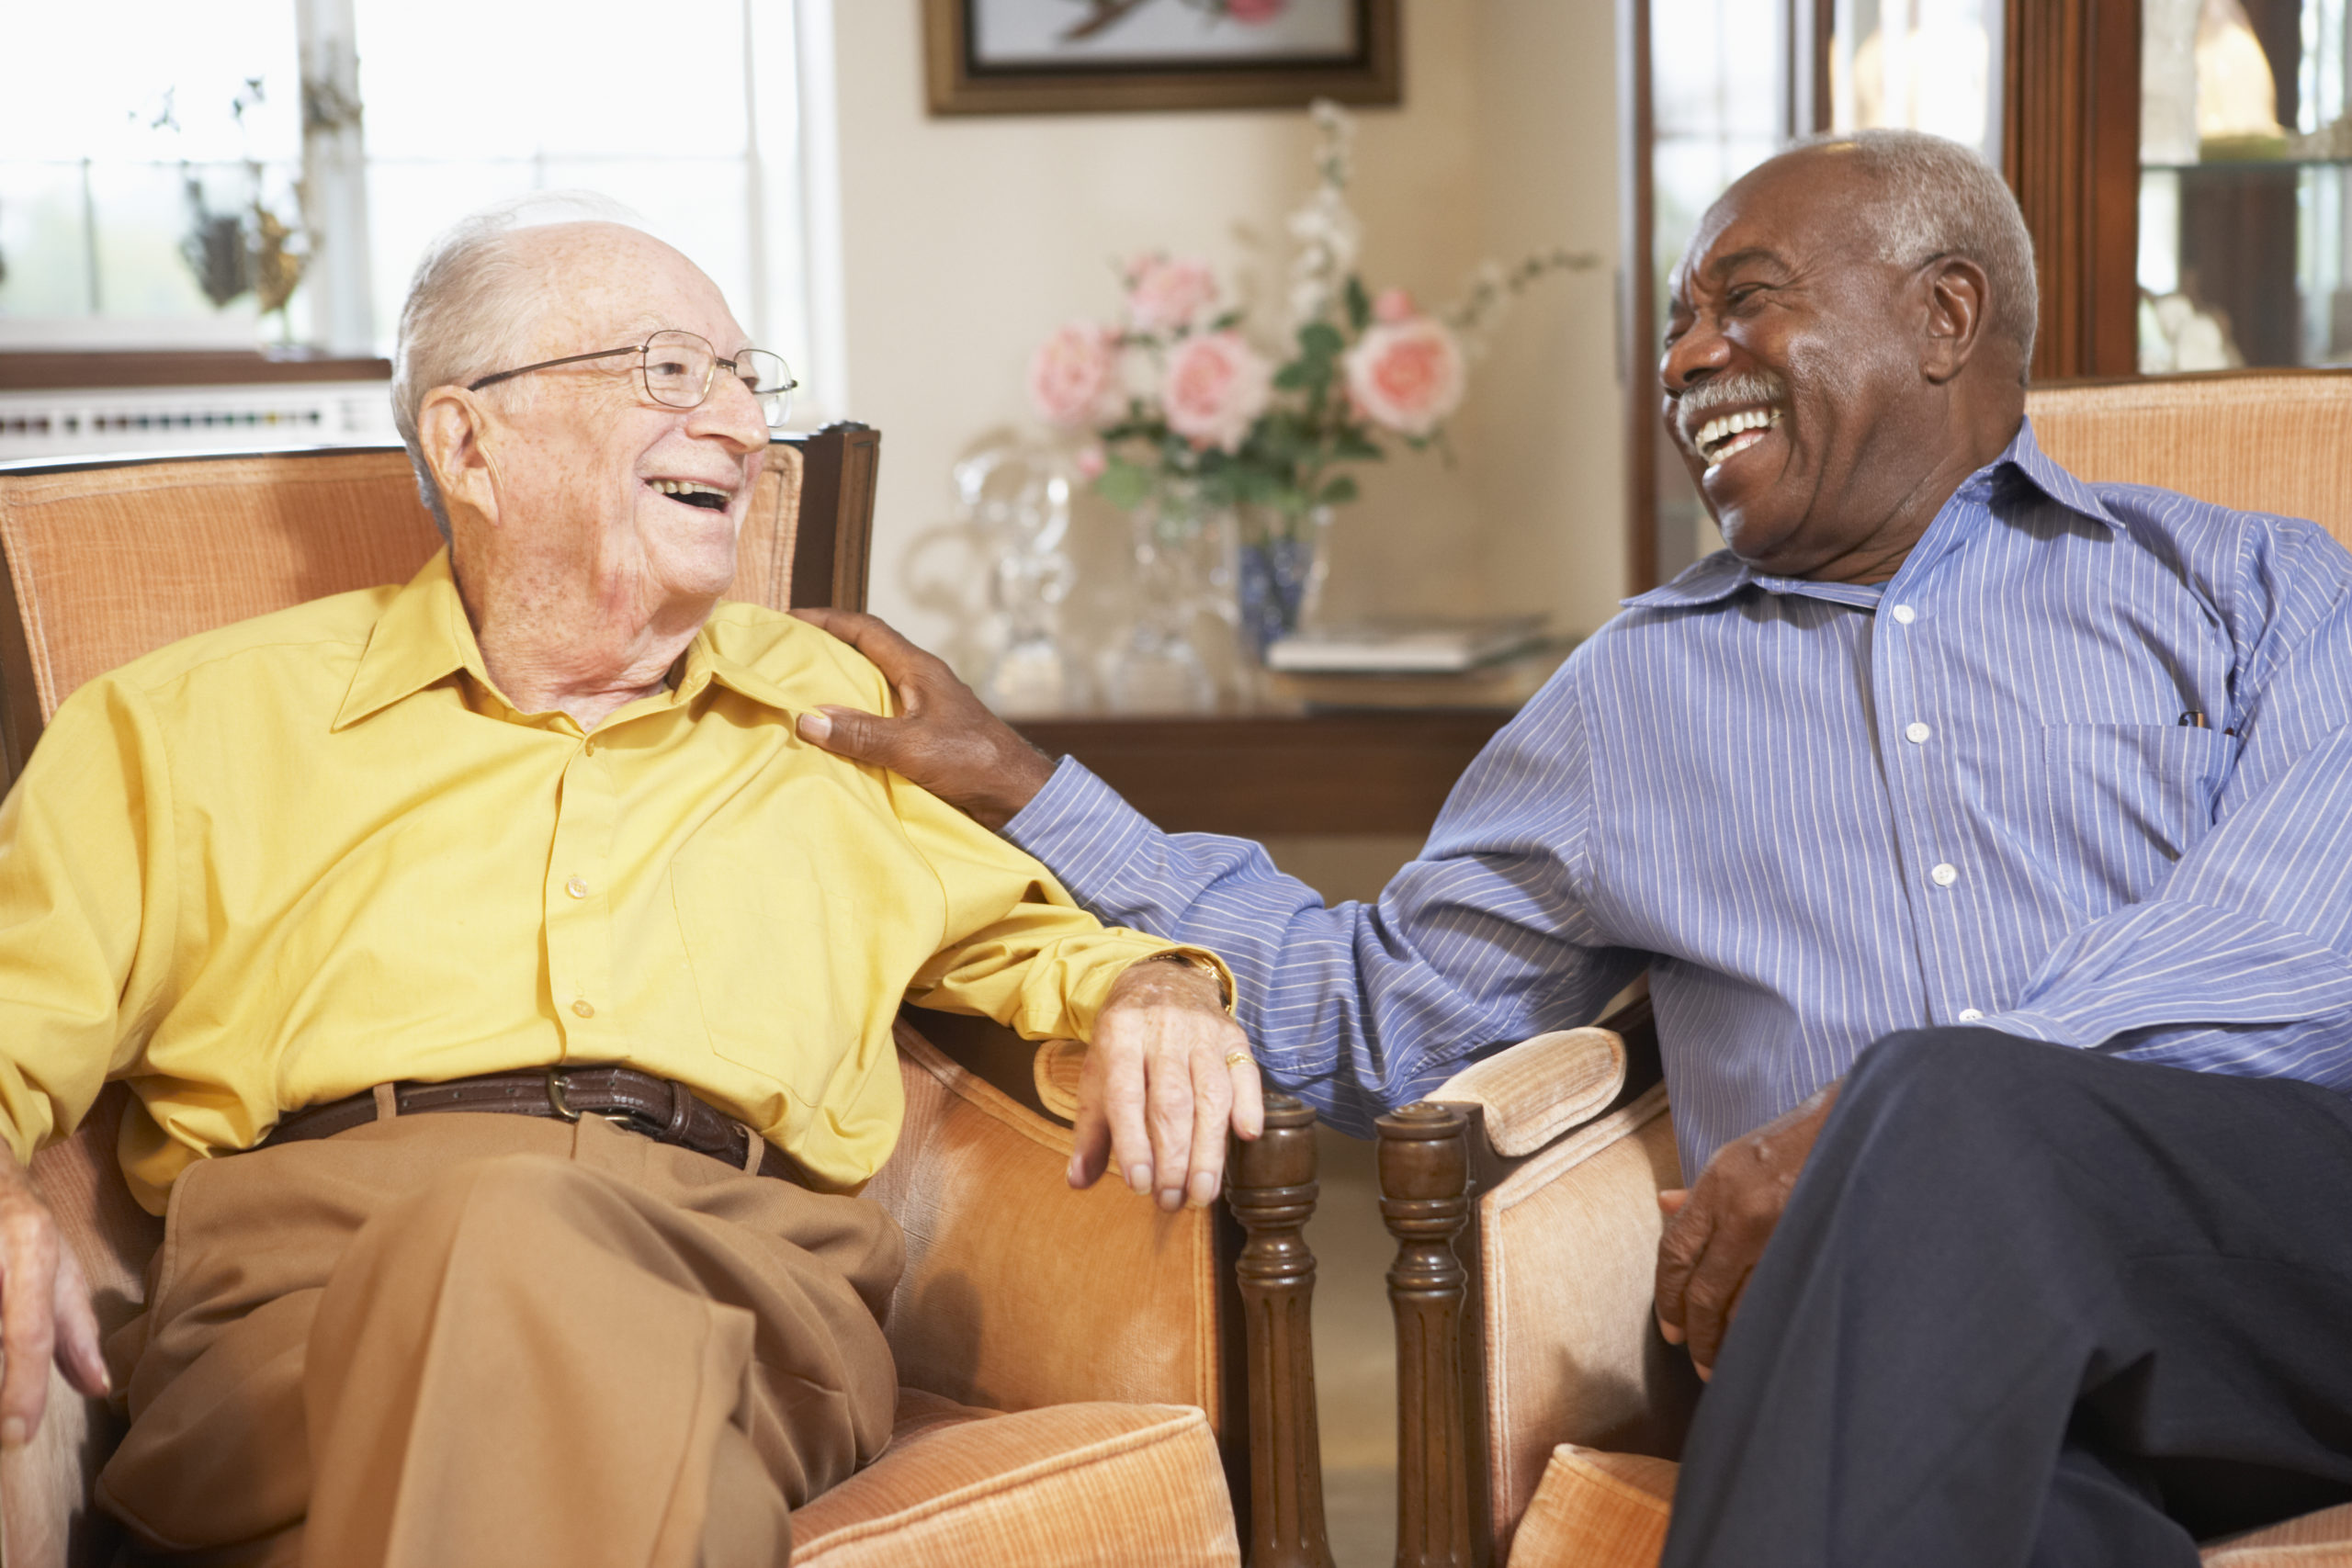 Two older men smiling